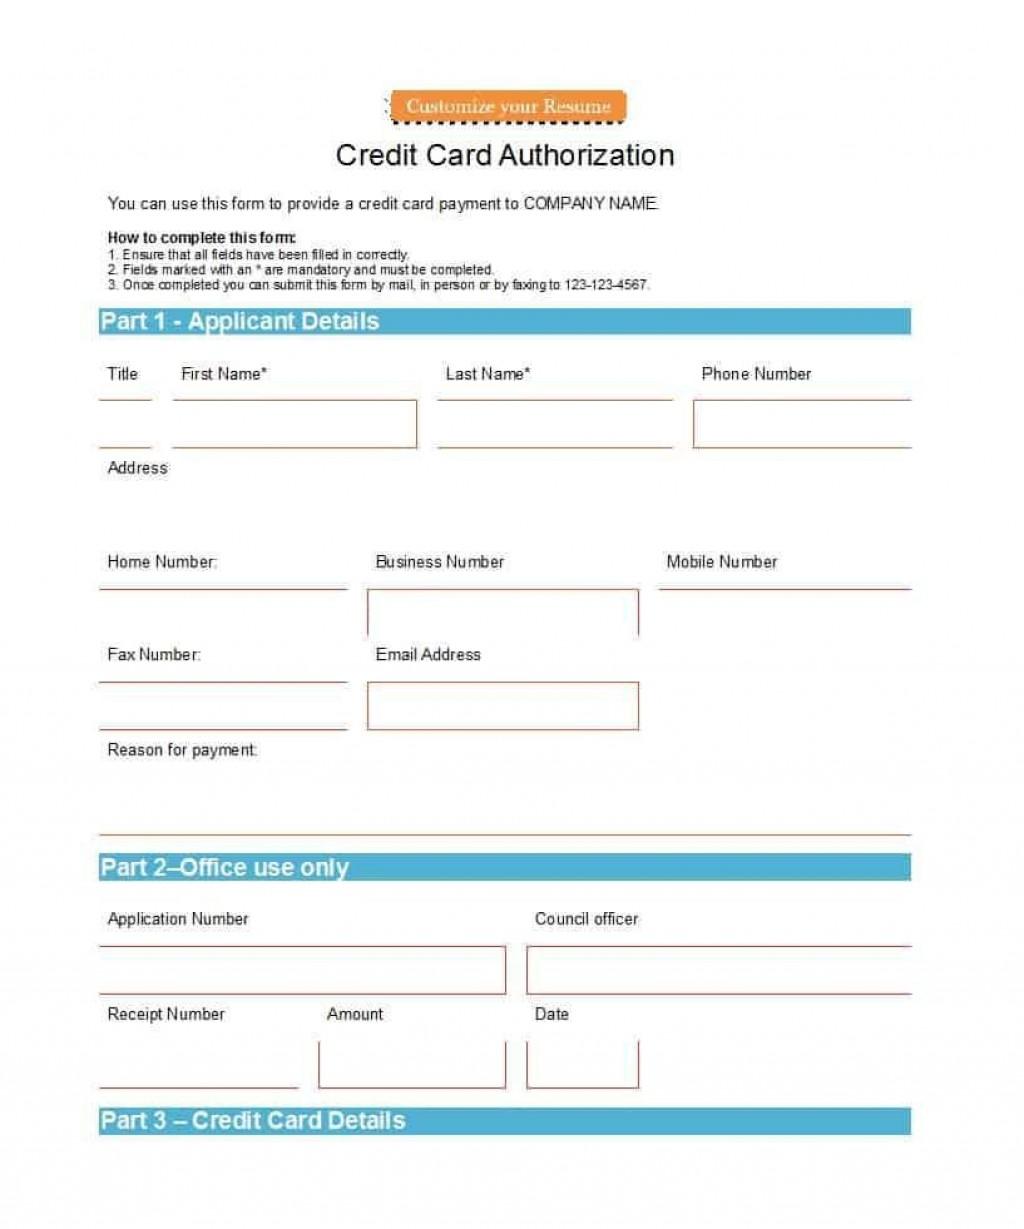 001 Impressive Credit Card Payment Form Template Html Inspiration Large